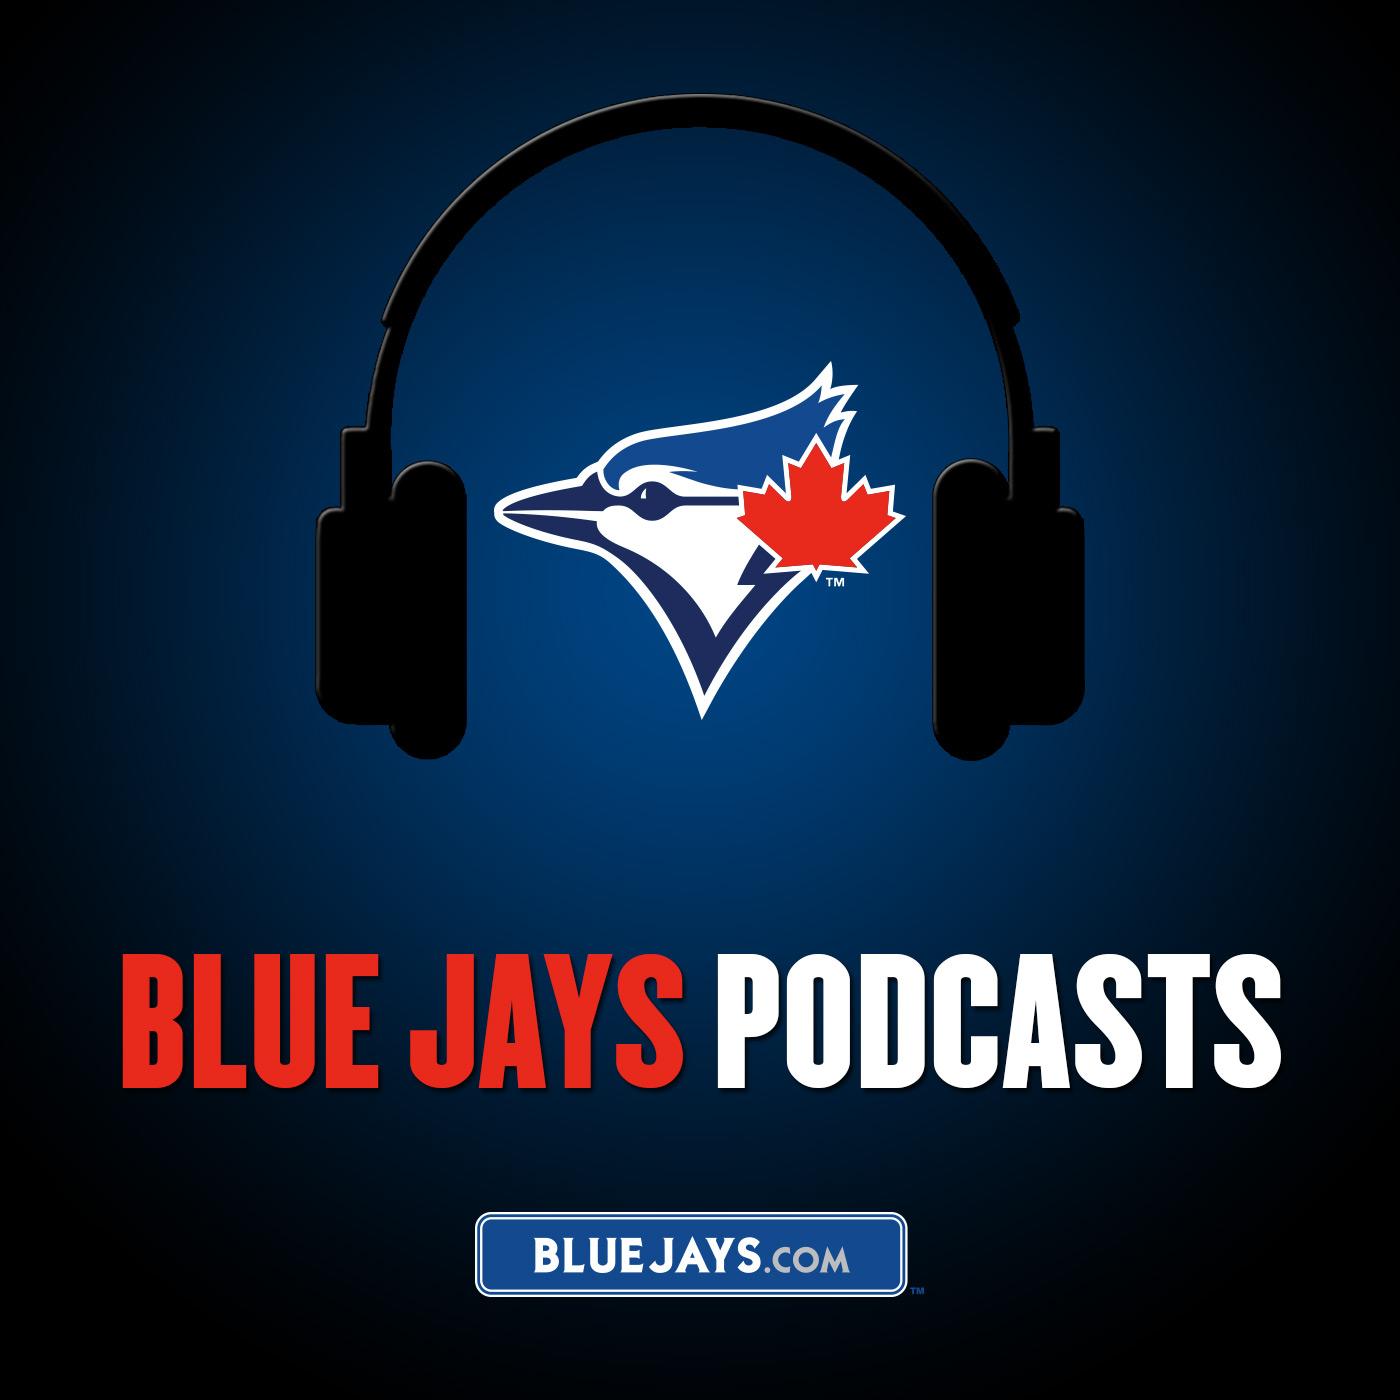 <![CDATA[Toronto Blue Jays Podcast]]>